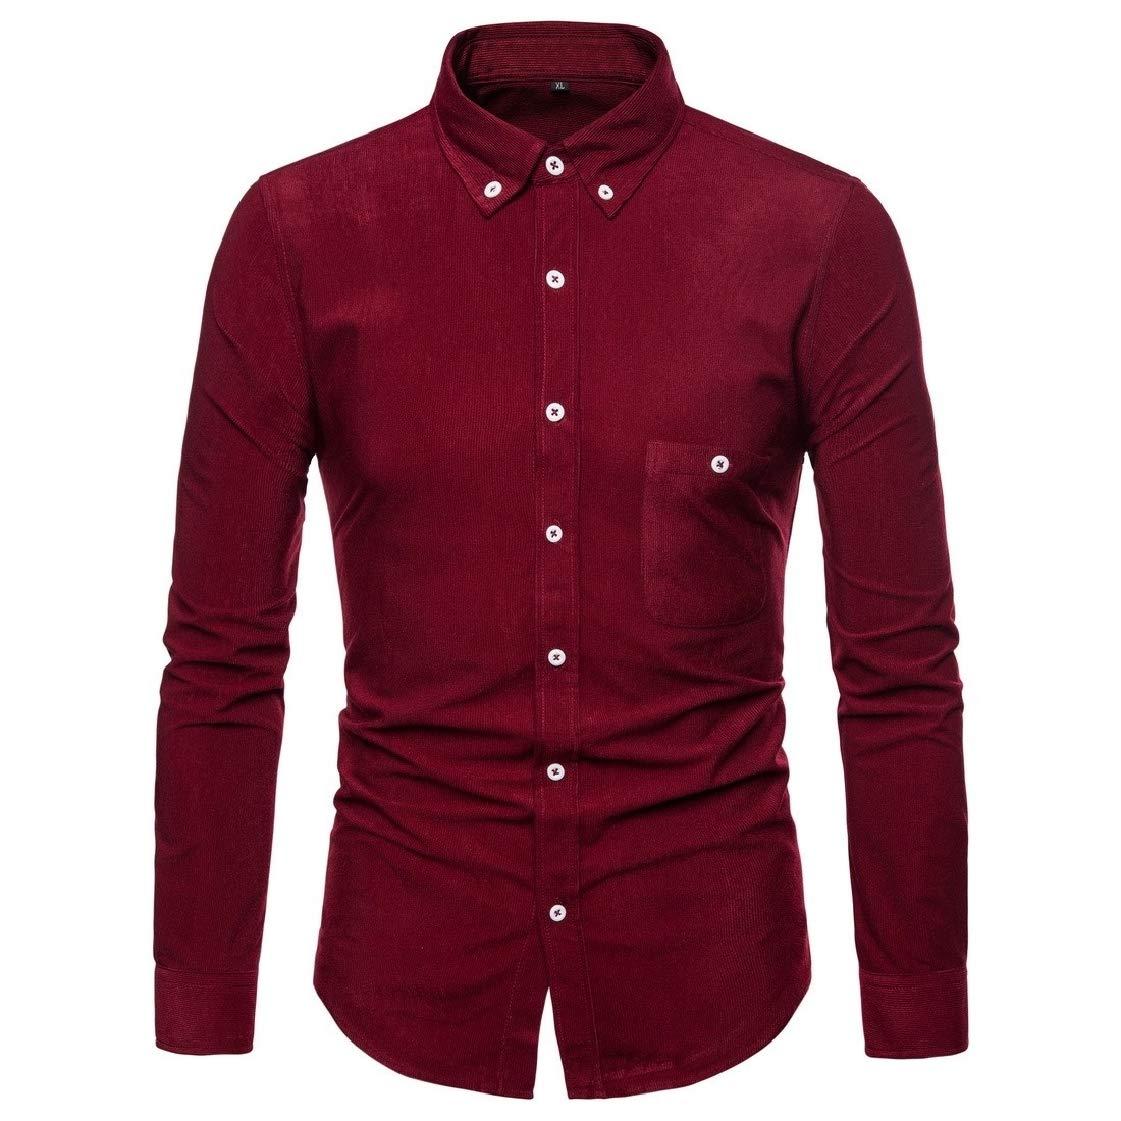 Coolred-Men Regular Fit Corduroy Button-Collar Business Shirts